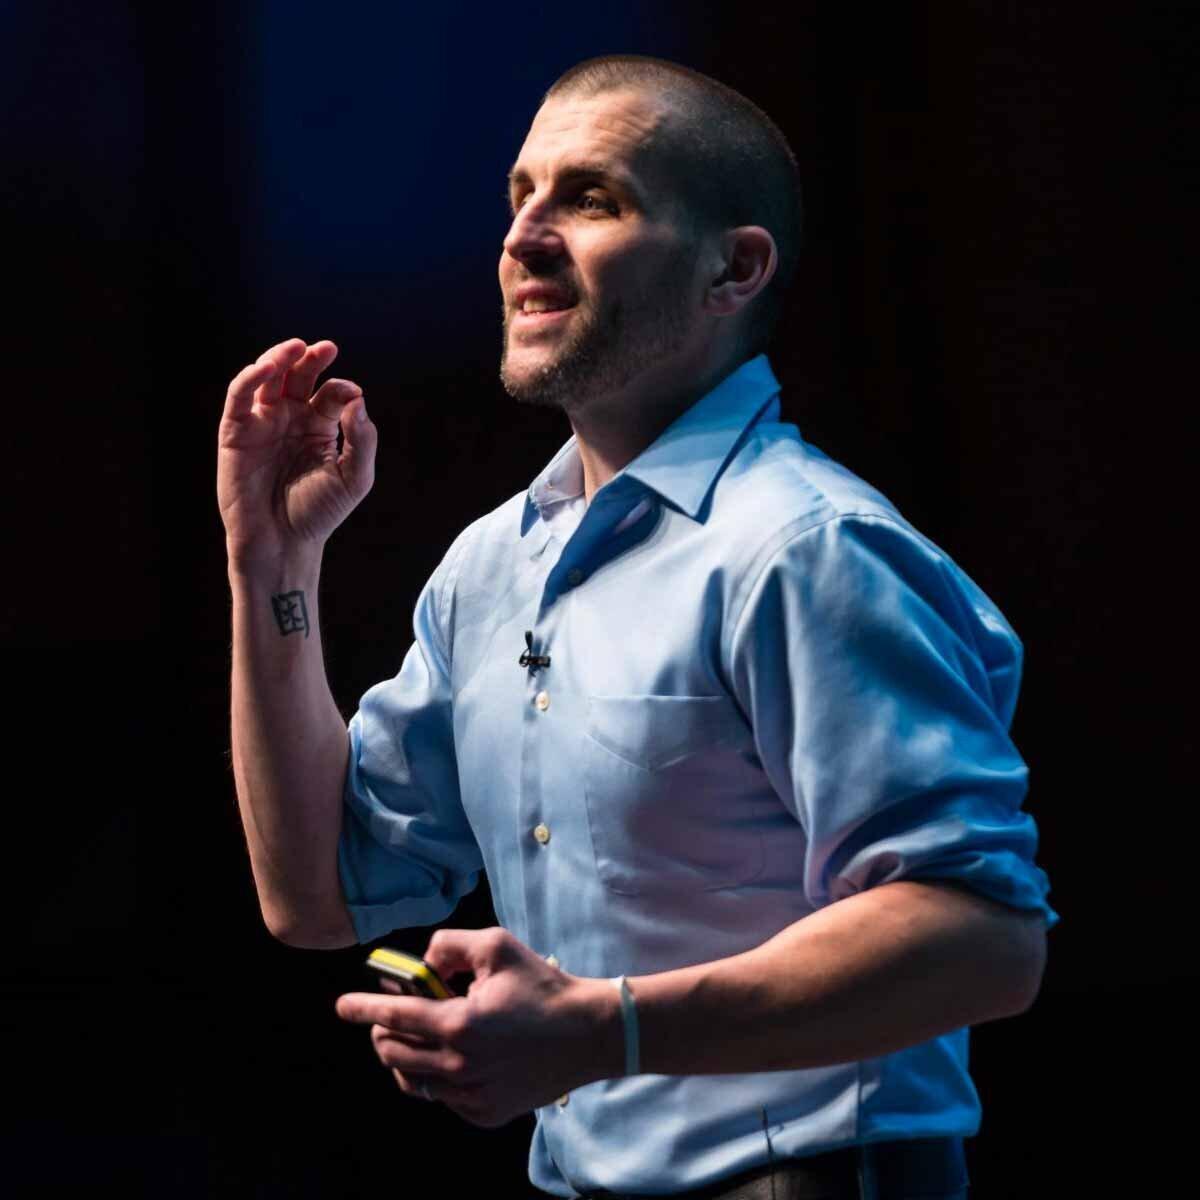 Photograph of Scott Berkun